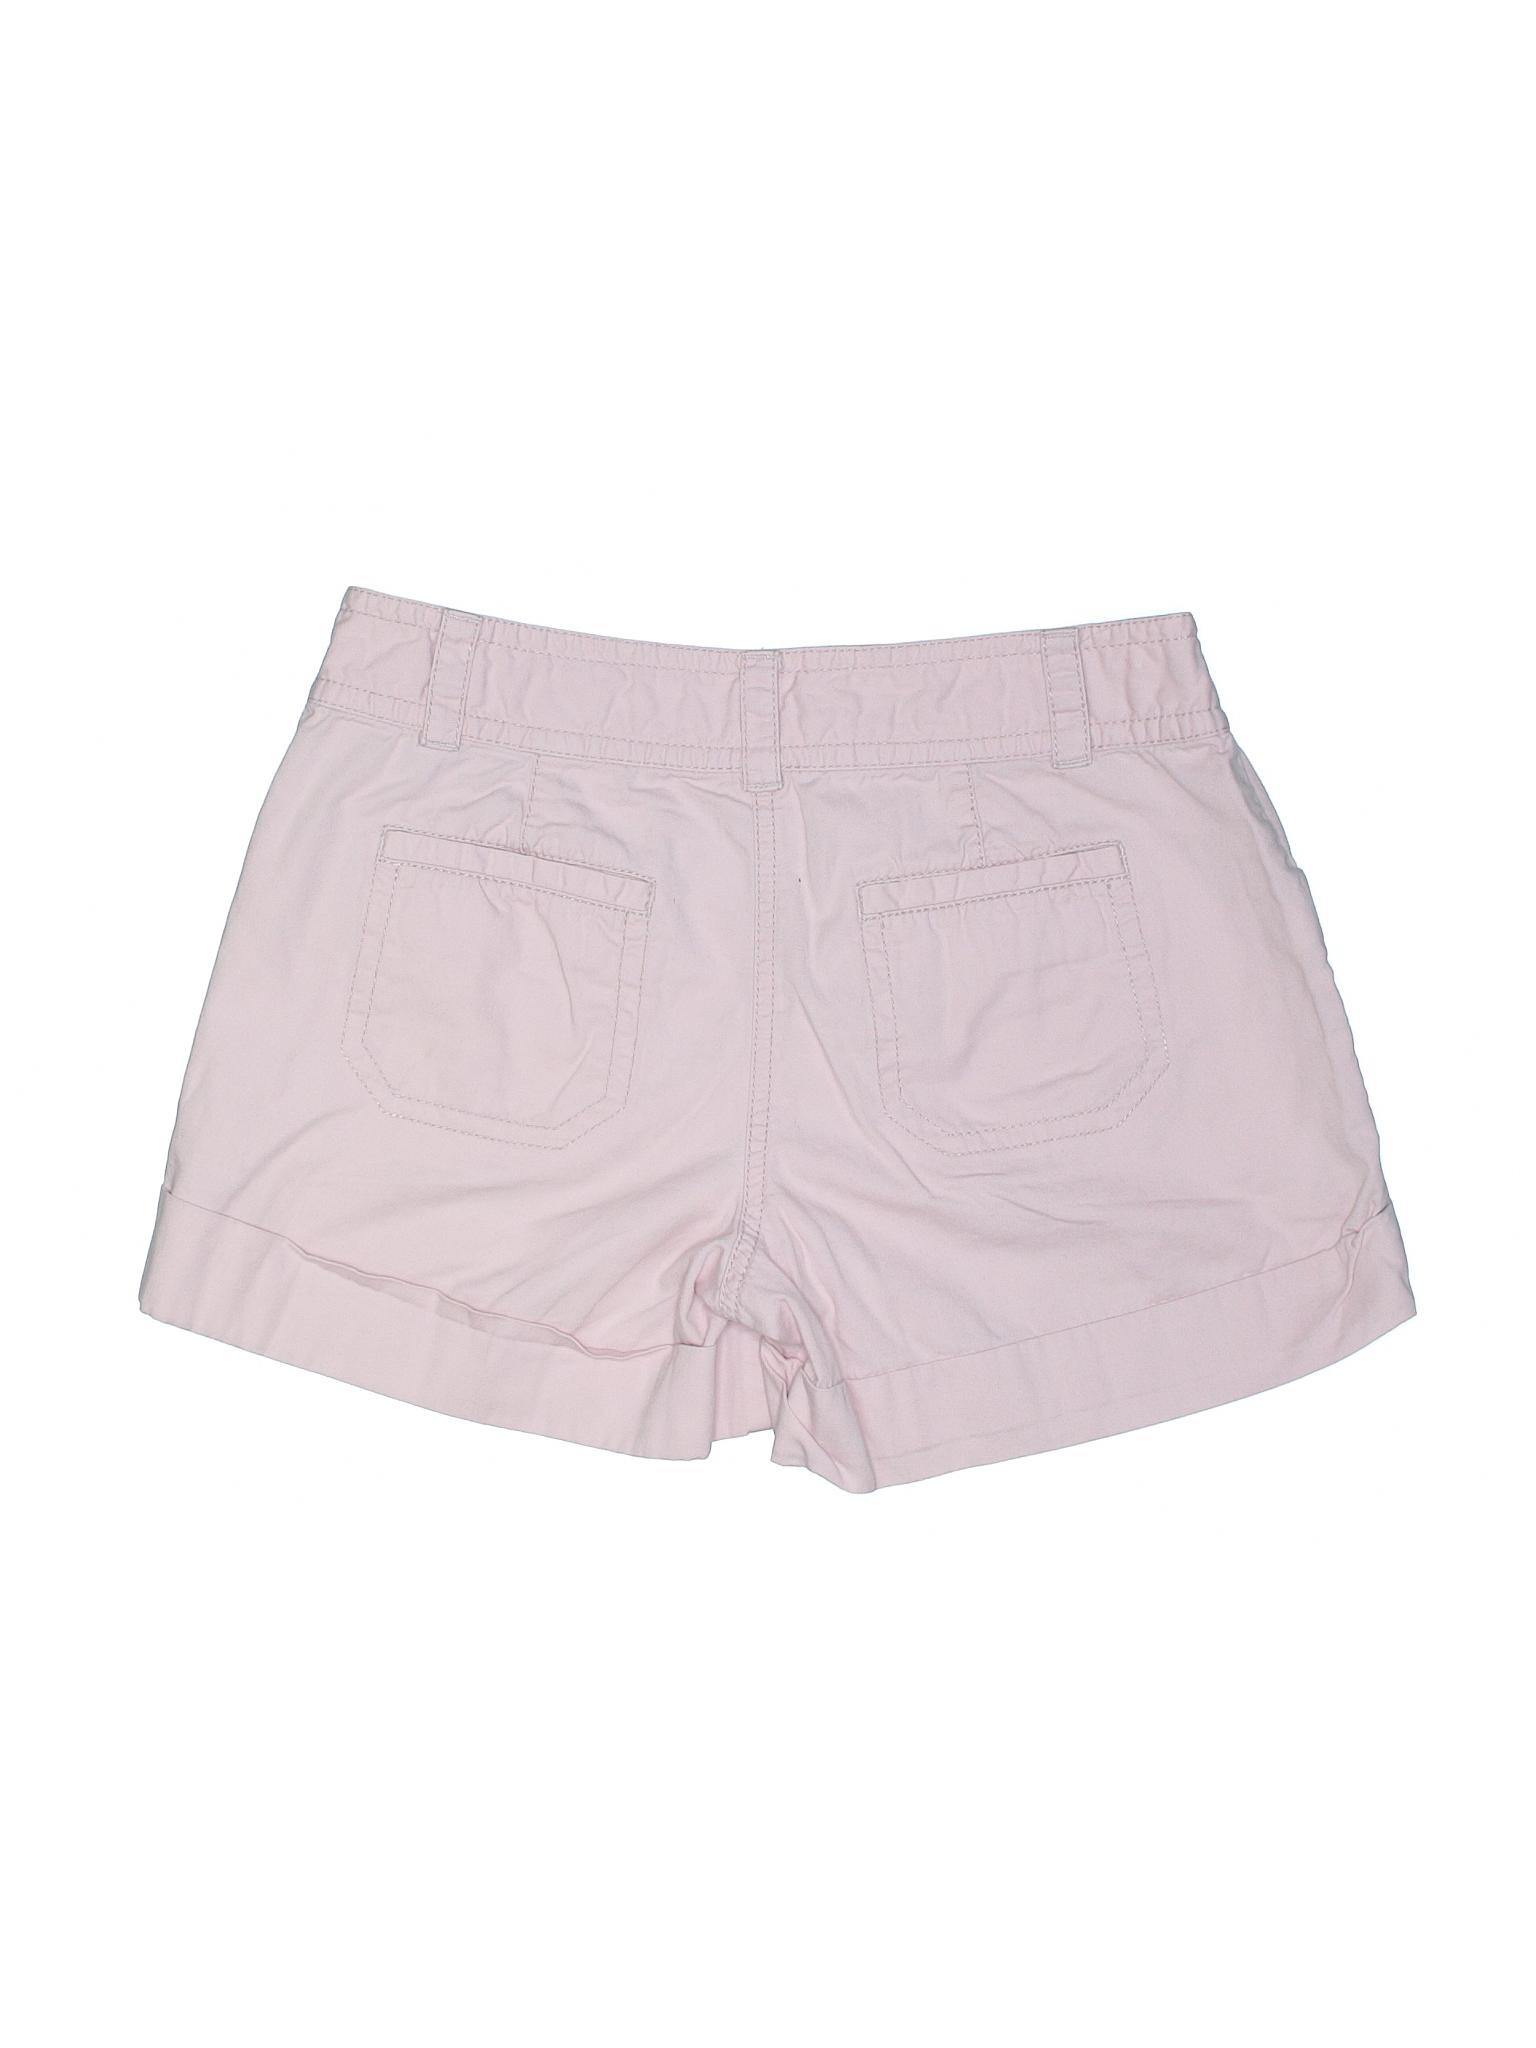 Taylor Ann Cargo Shorts Boutique LOFT wR5Bxwaq